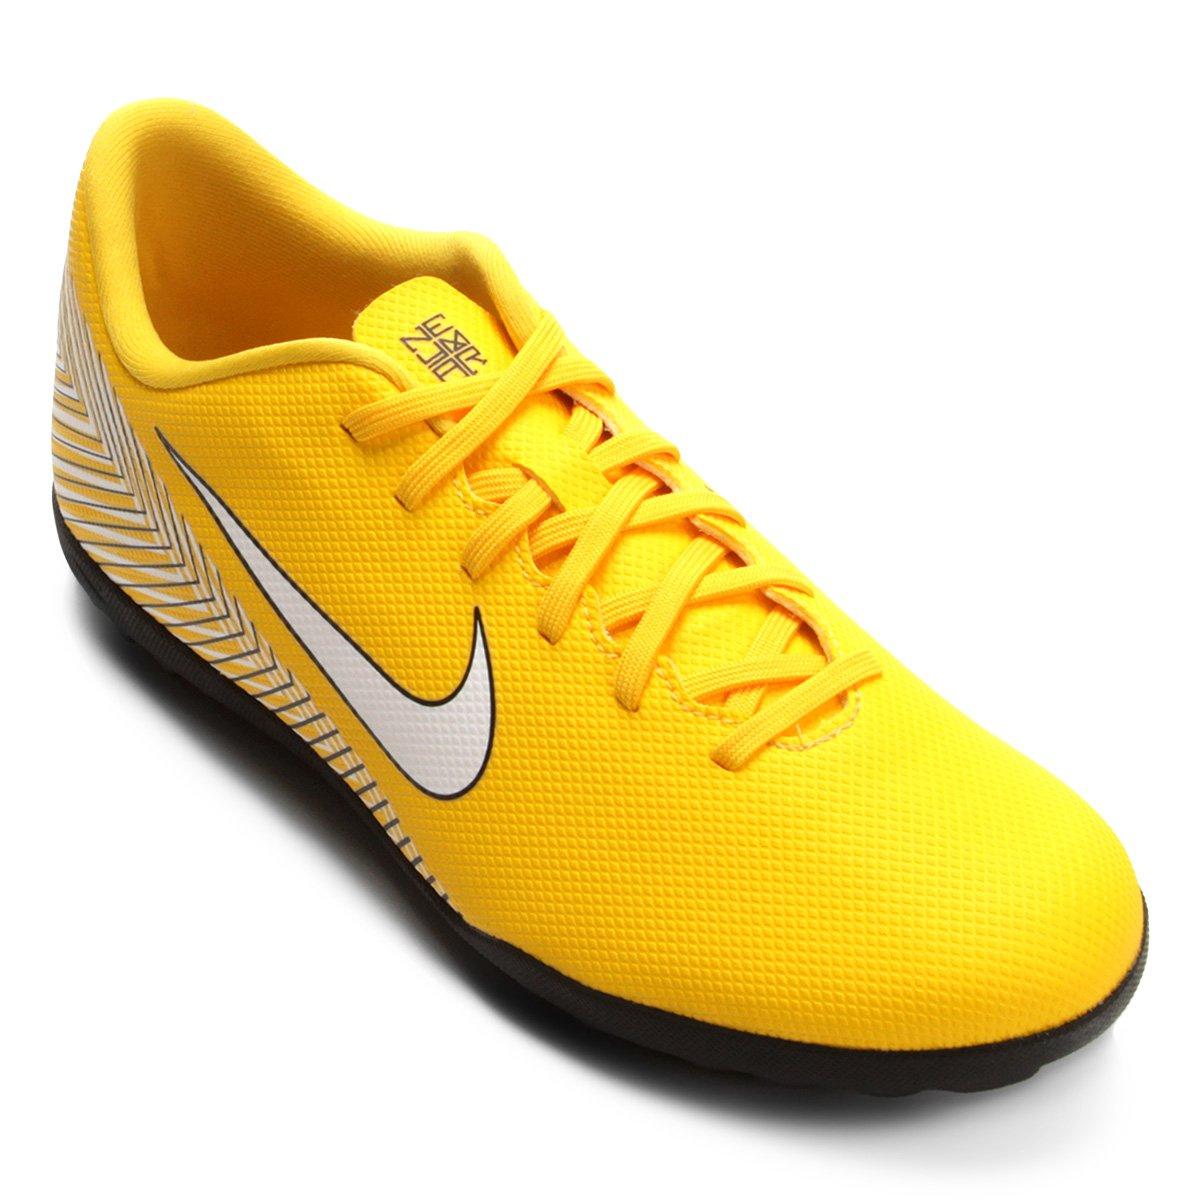 b204bcabcec Chuteira Society Nike Mercurial Vapor 12 Club Neymar TF - Shopping ...